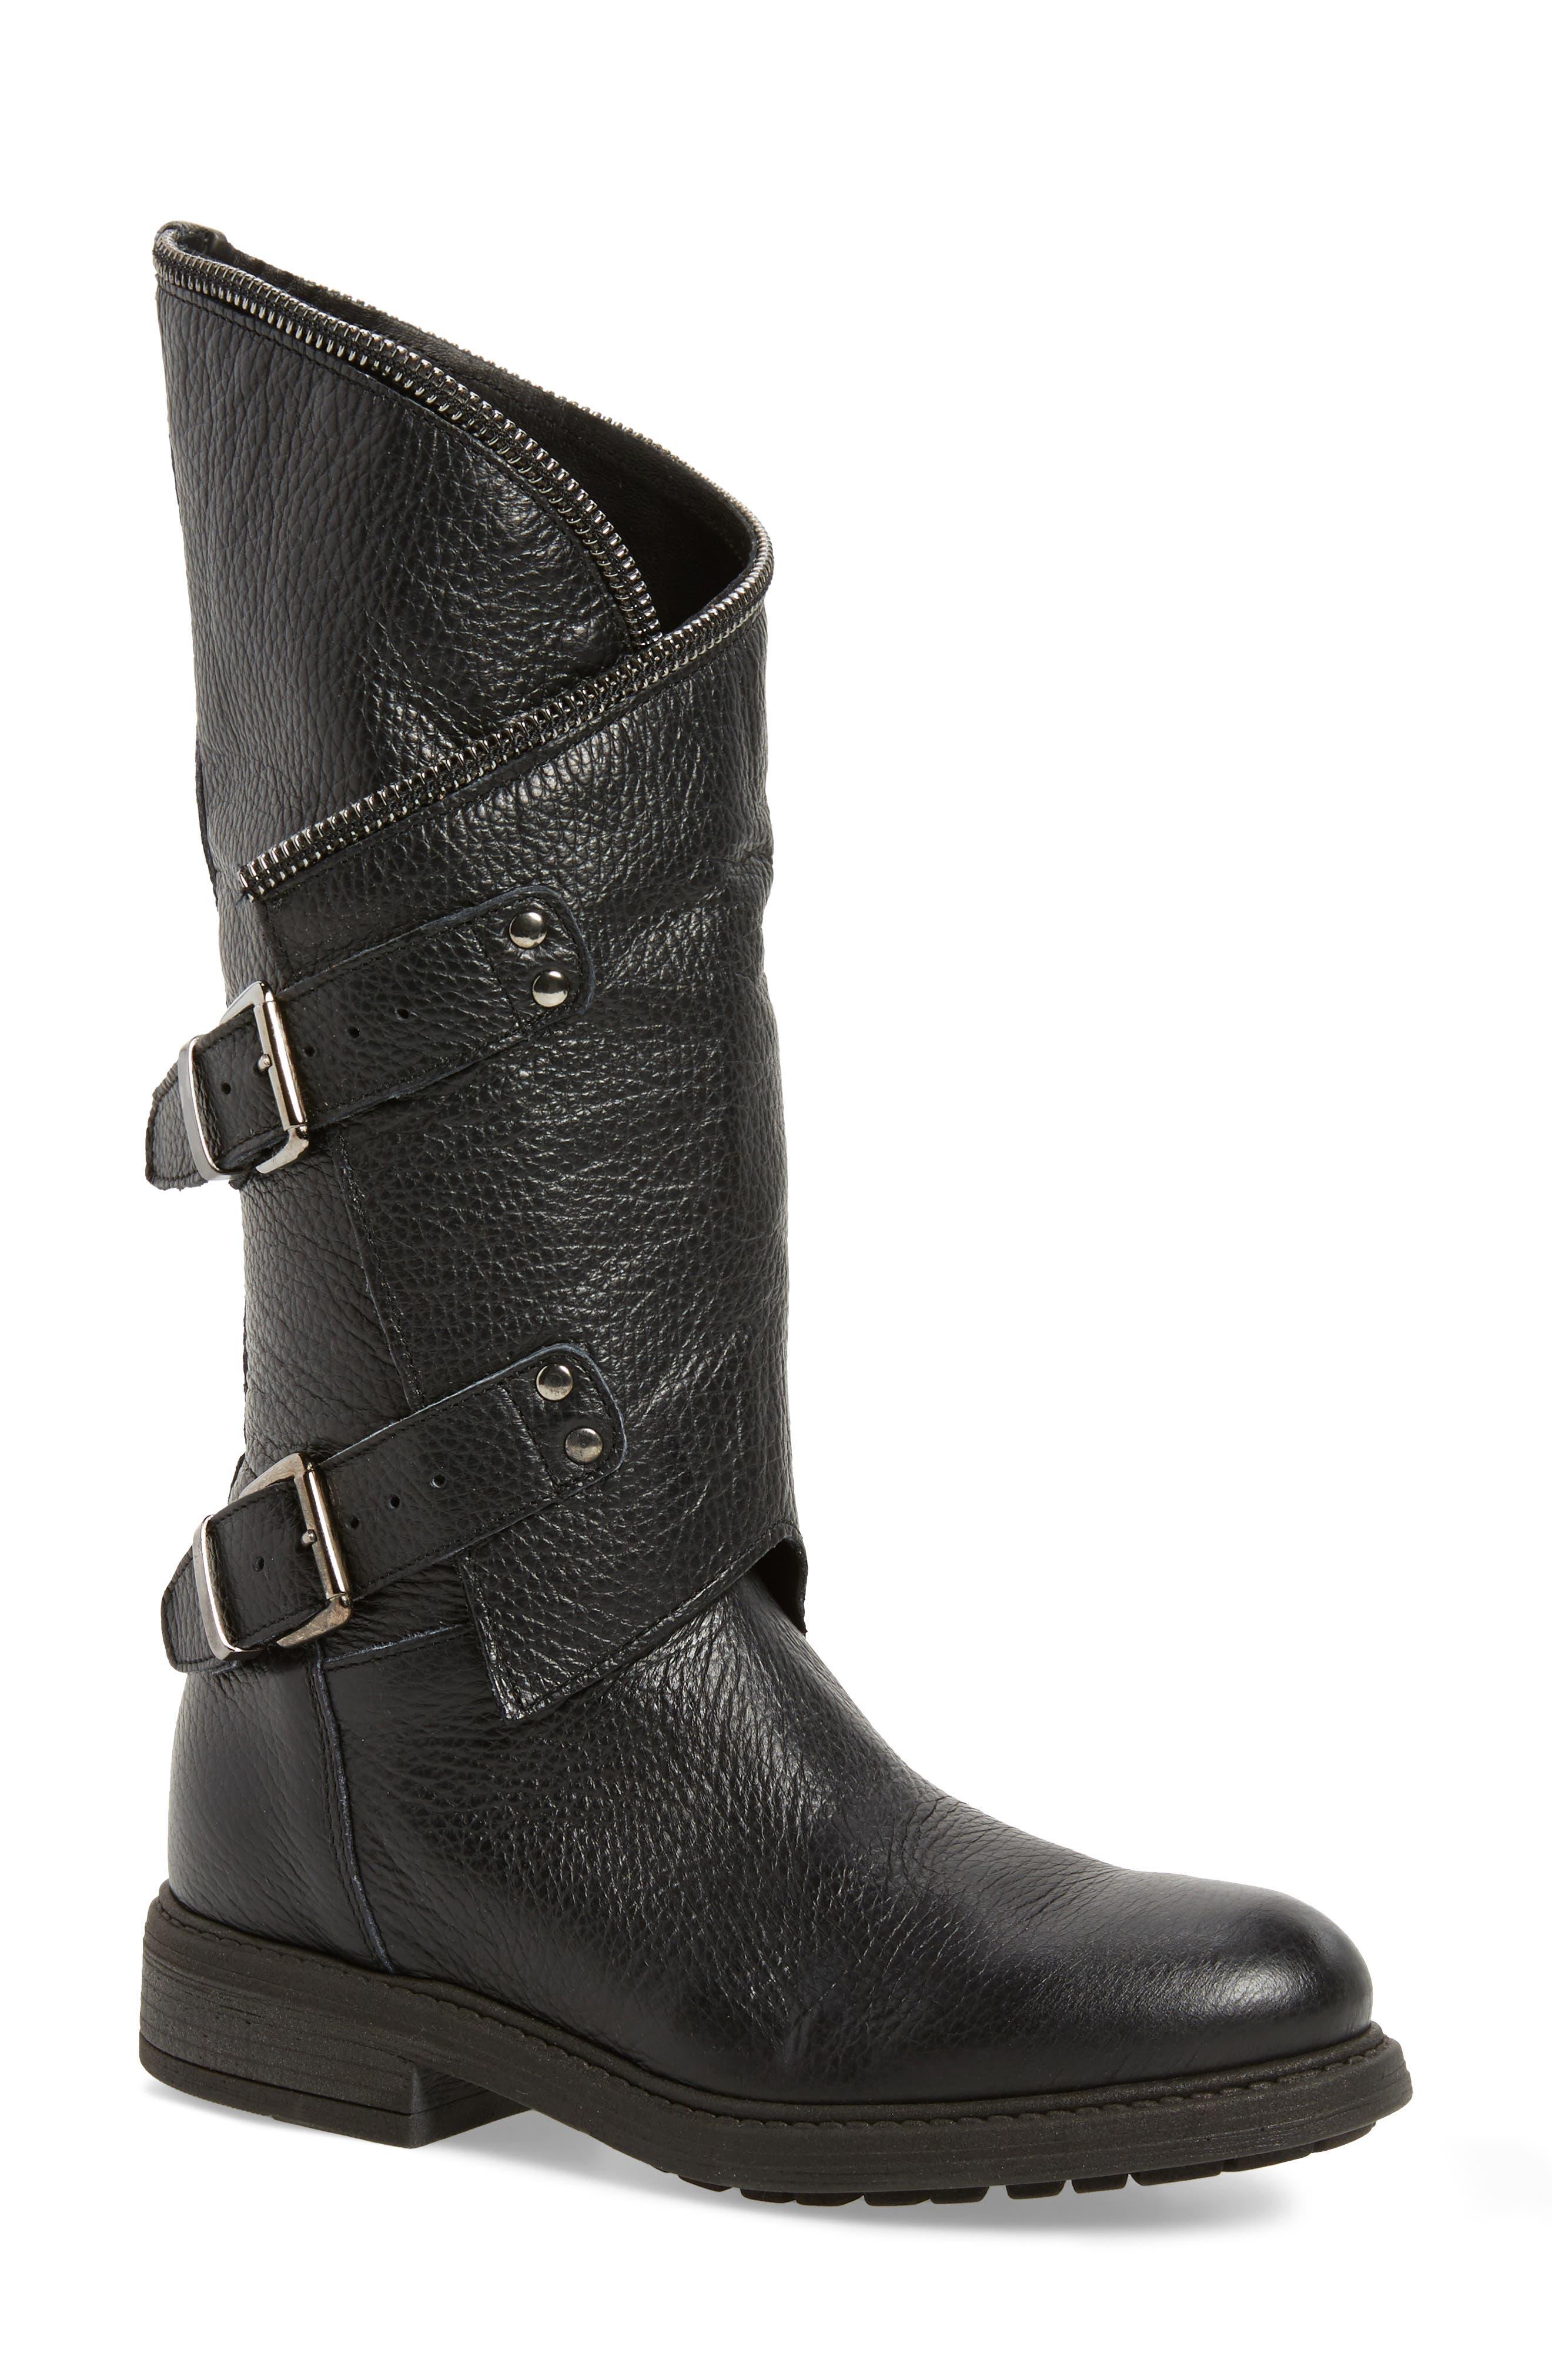 Bray Asymmetrical Zip Boot,                             Main thumbnail 1, color,                             Black Leather